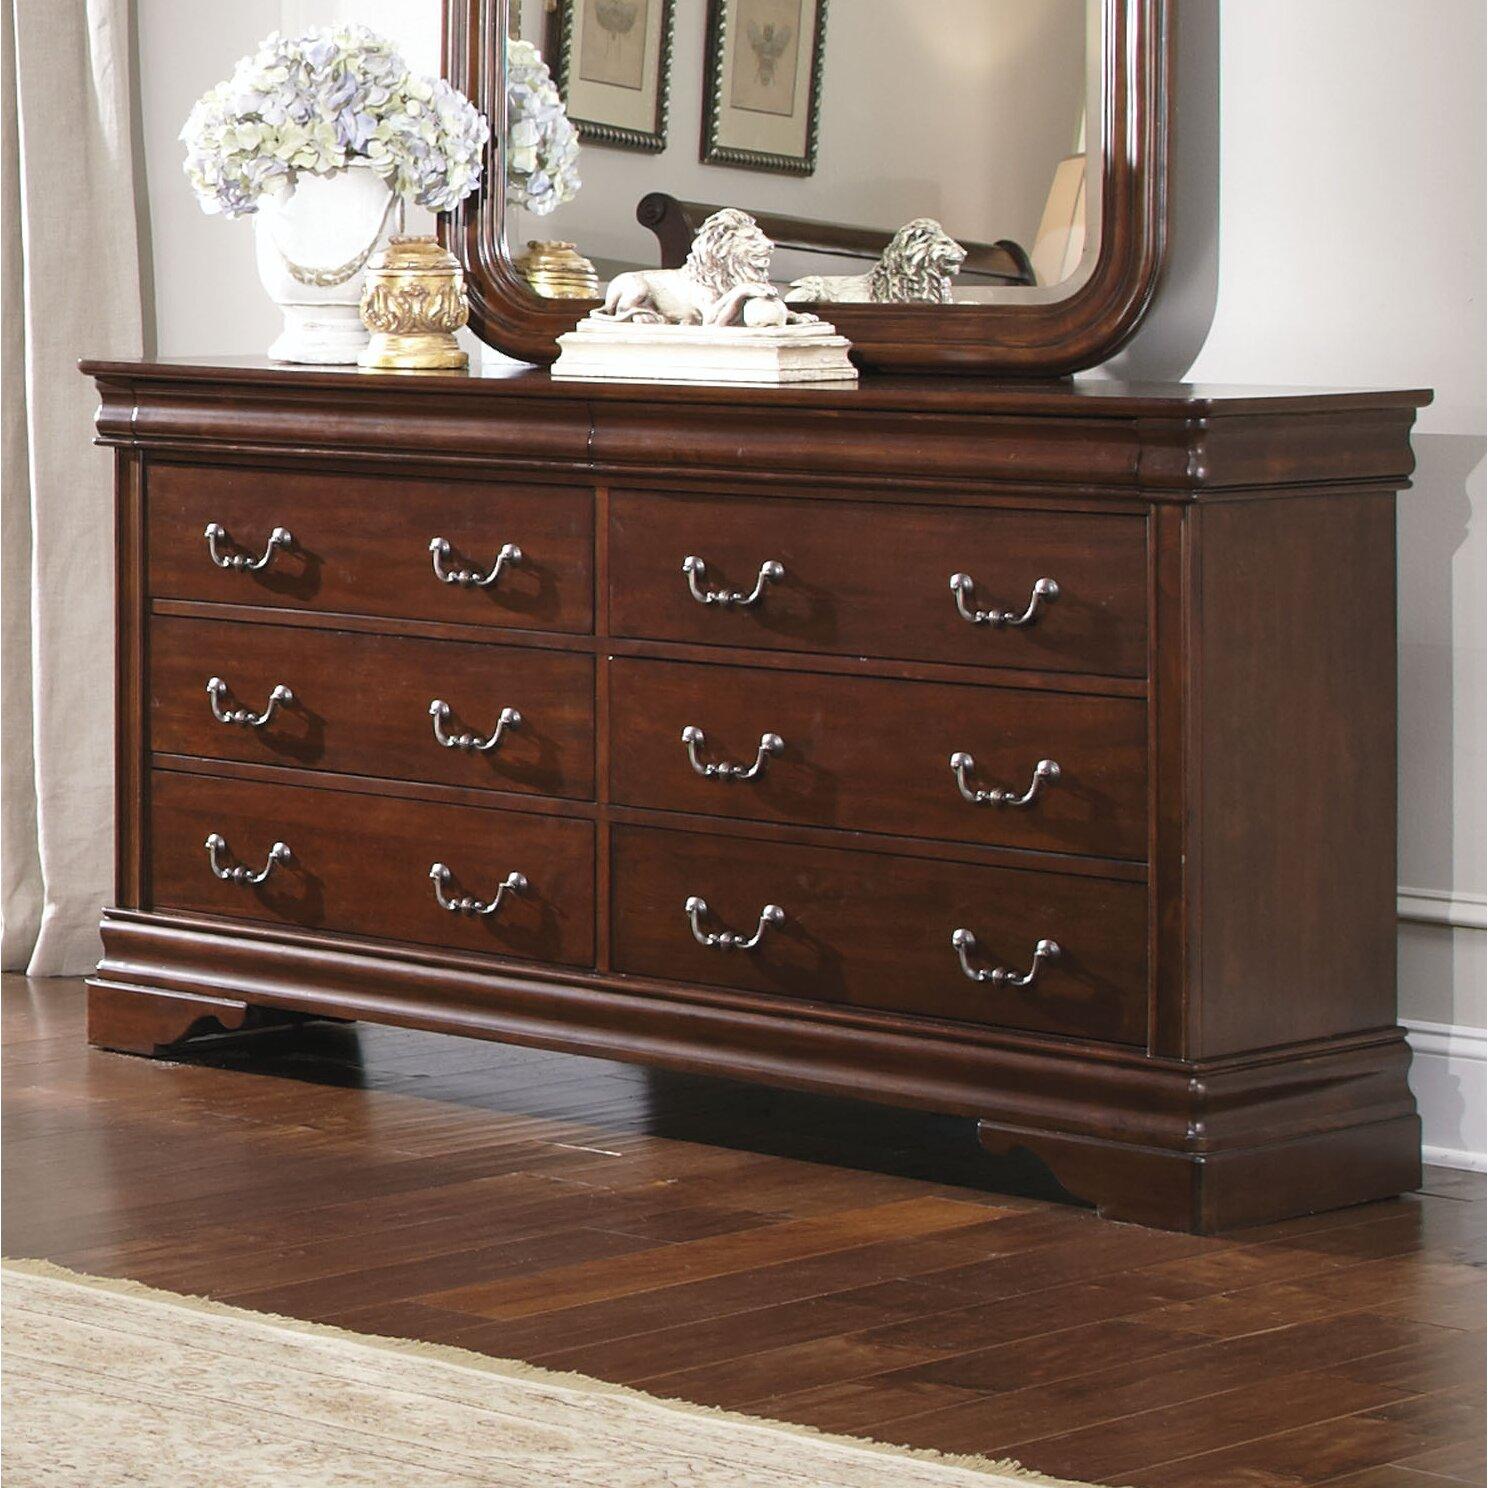 Liberty Furniture Carriage Court Sleigh Customizable Bedroom Set Reviews Wayfair